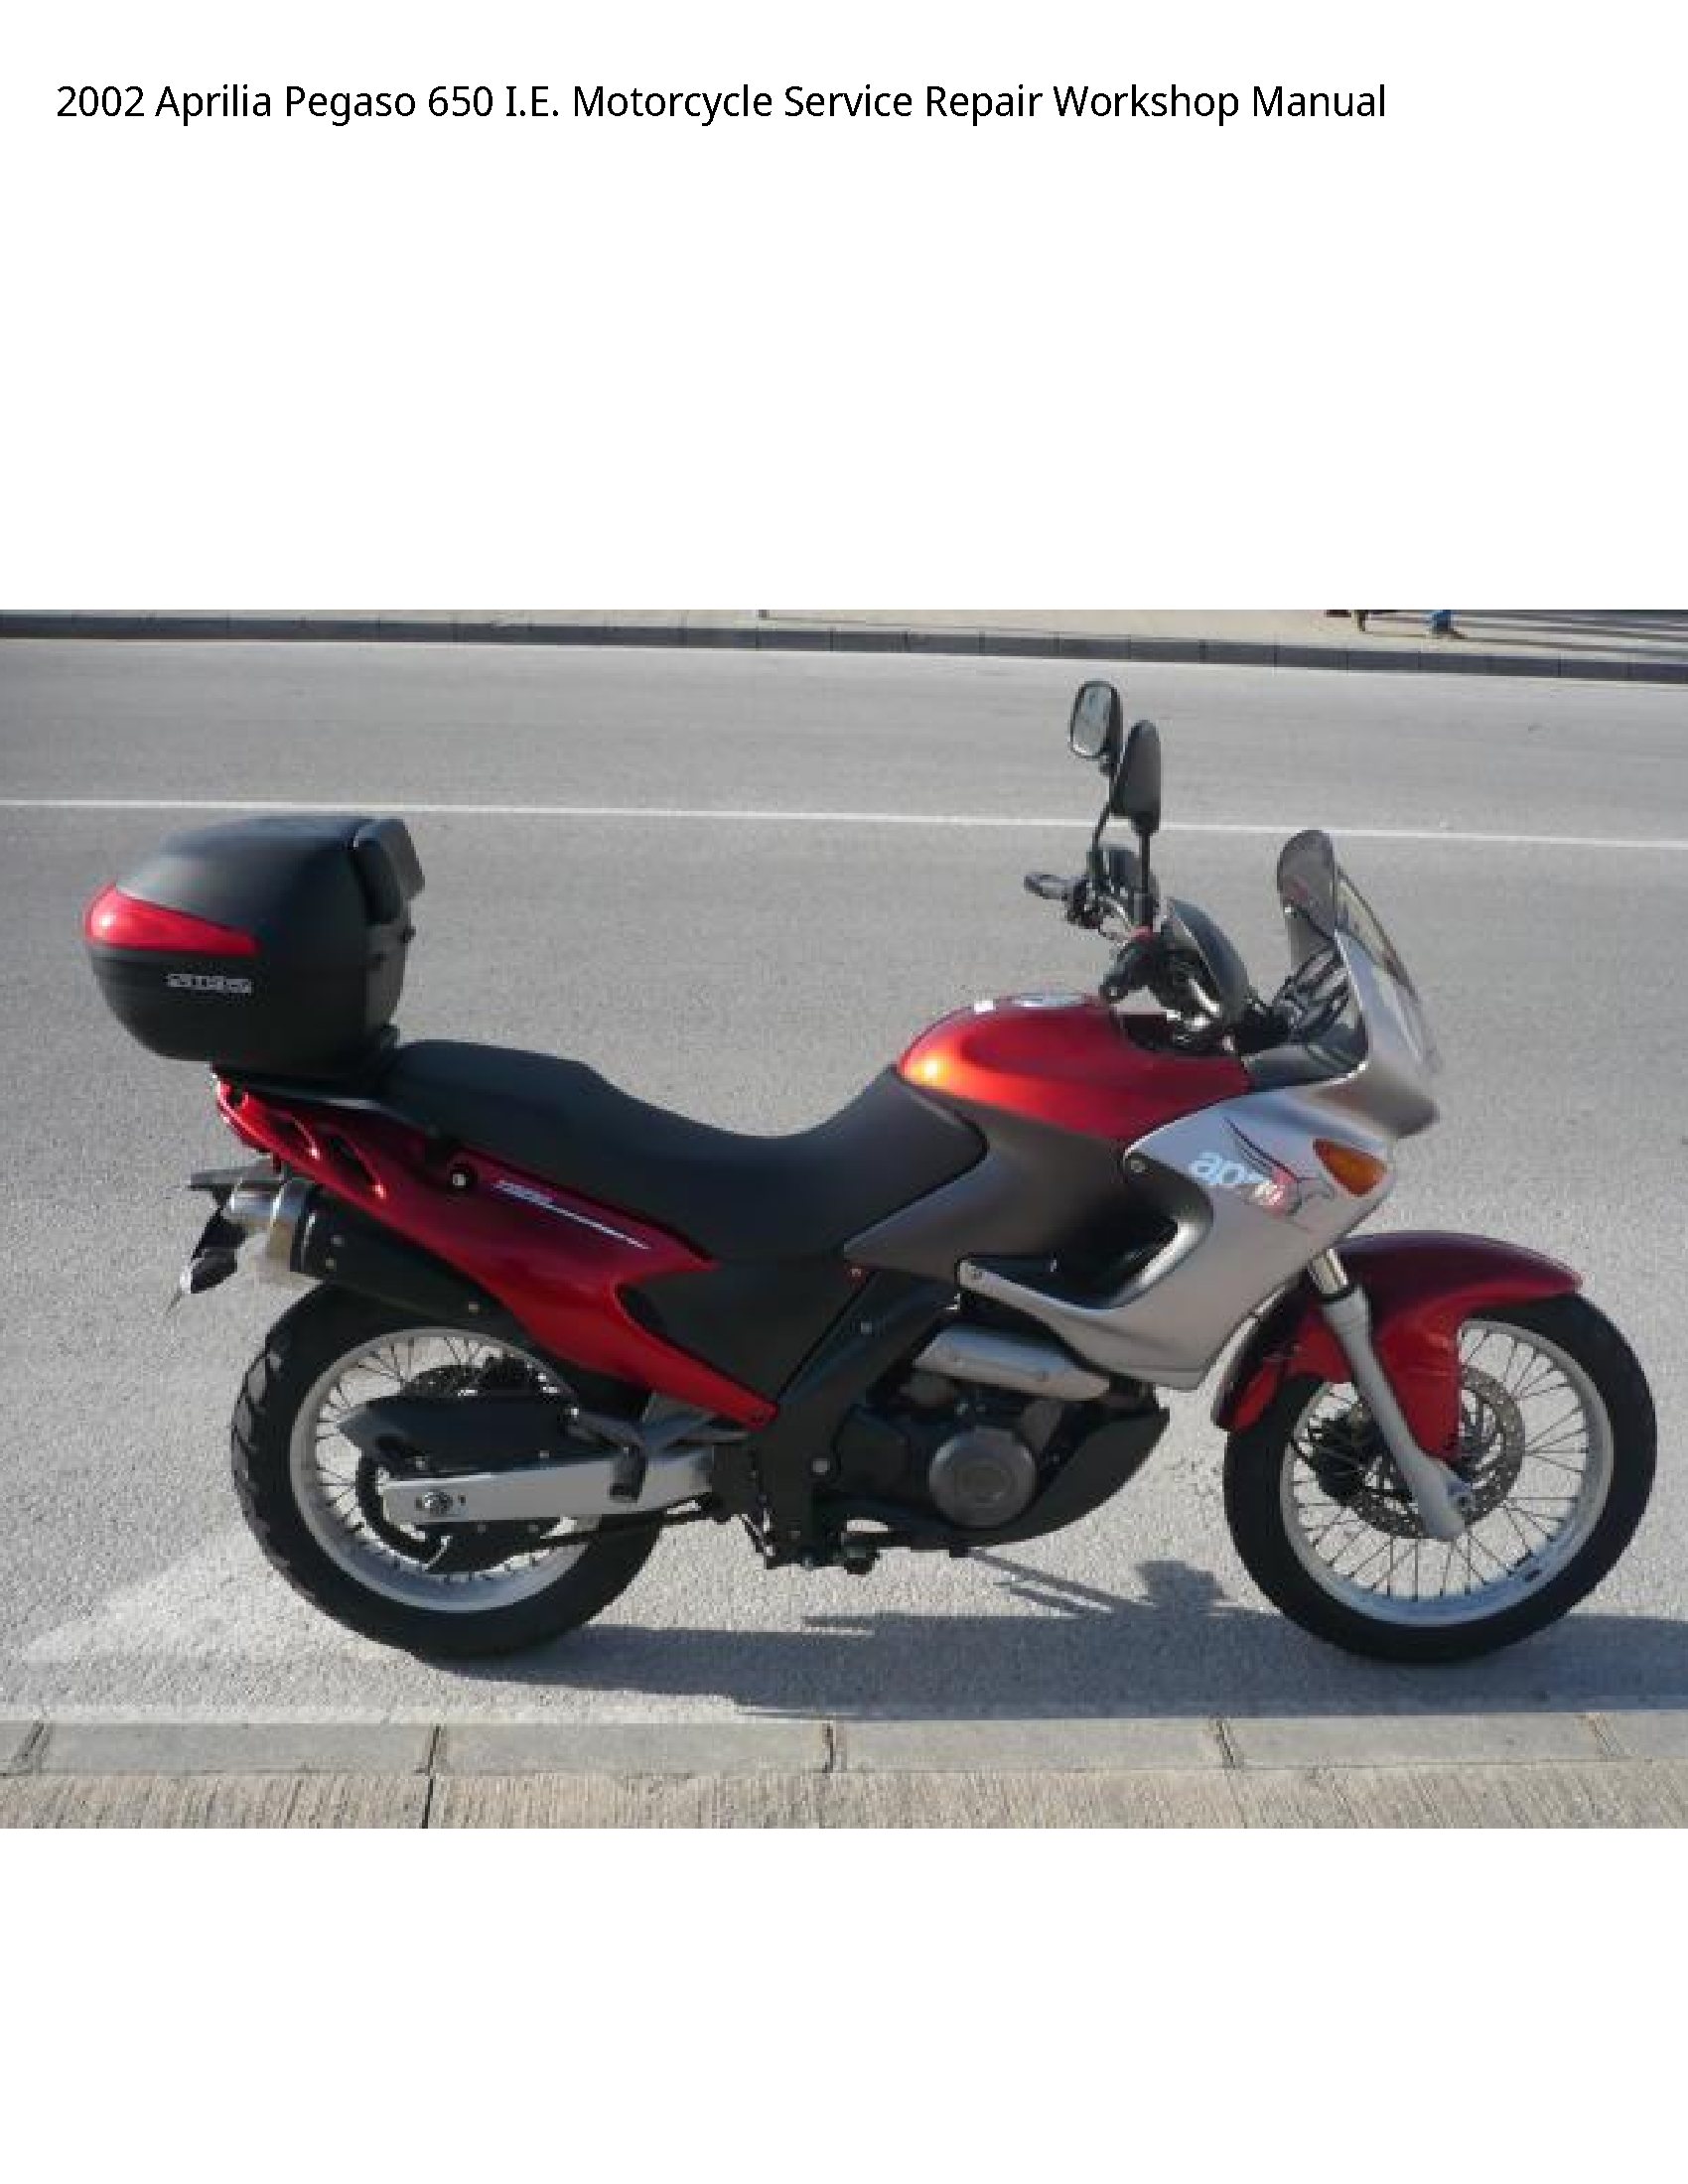 Aprilia 650 Pegaso I.E. Motorcycle manual